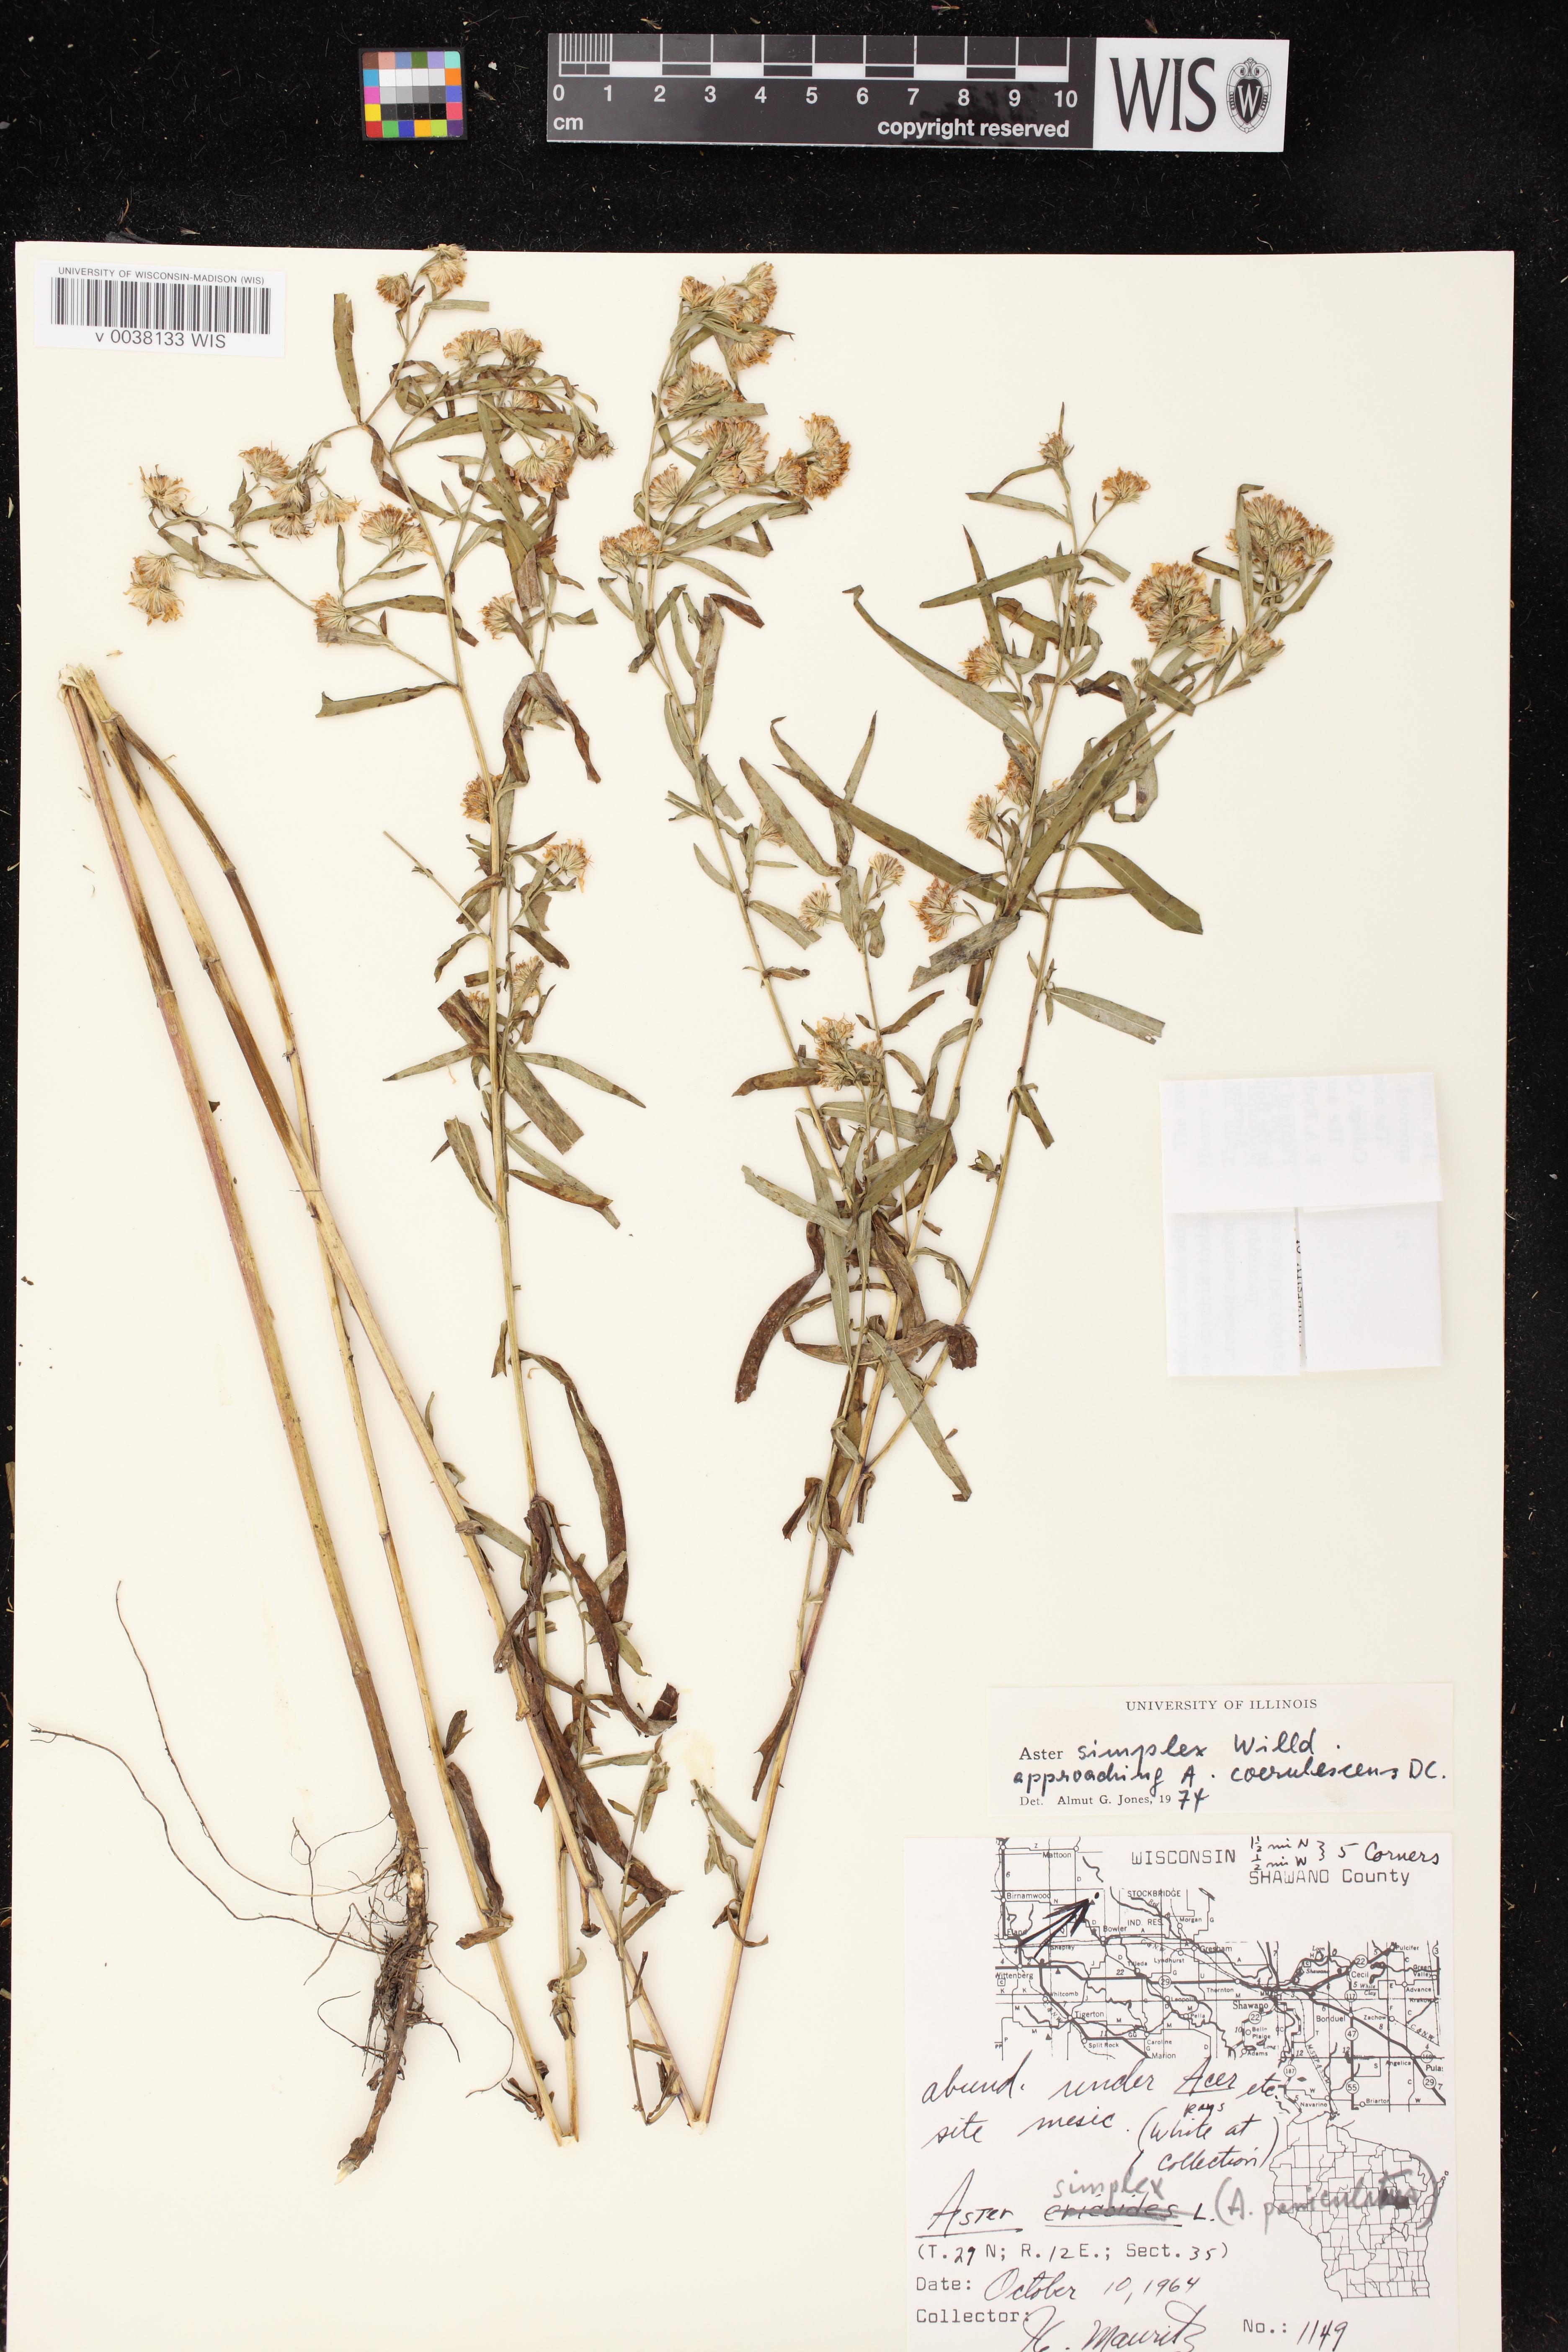 Image of Symphyotrichum lanceolatum var. lanceolatum x s. praealtum